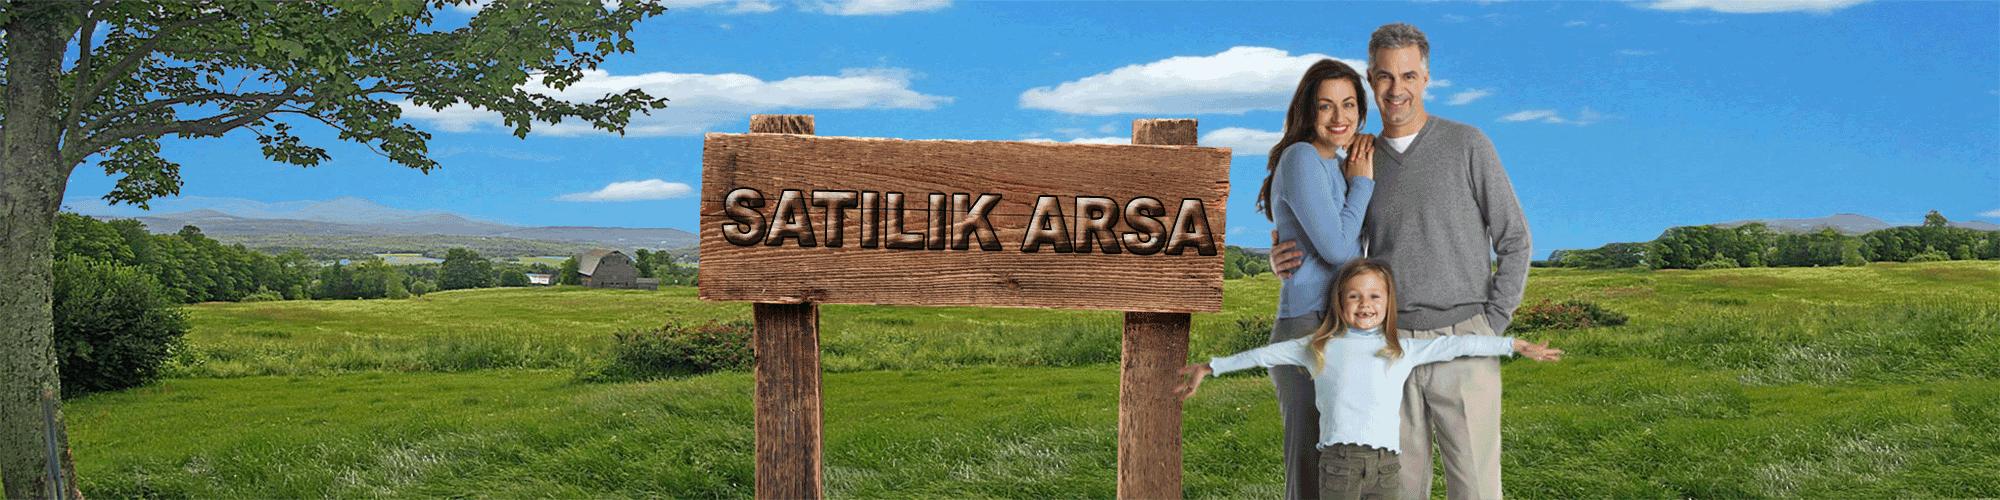 www.emlak34.com Istanbul Real  Estate 34 Sell Rent Land Field Villa Pavilion